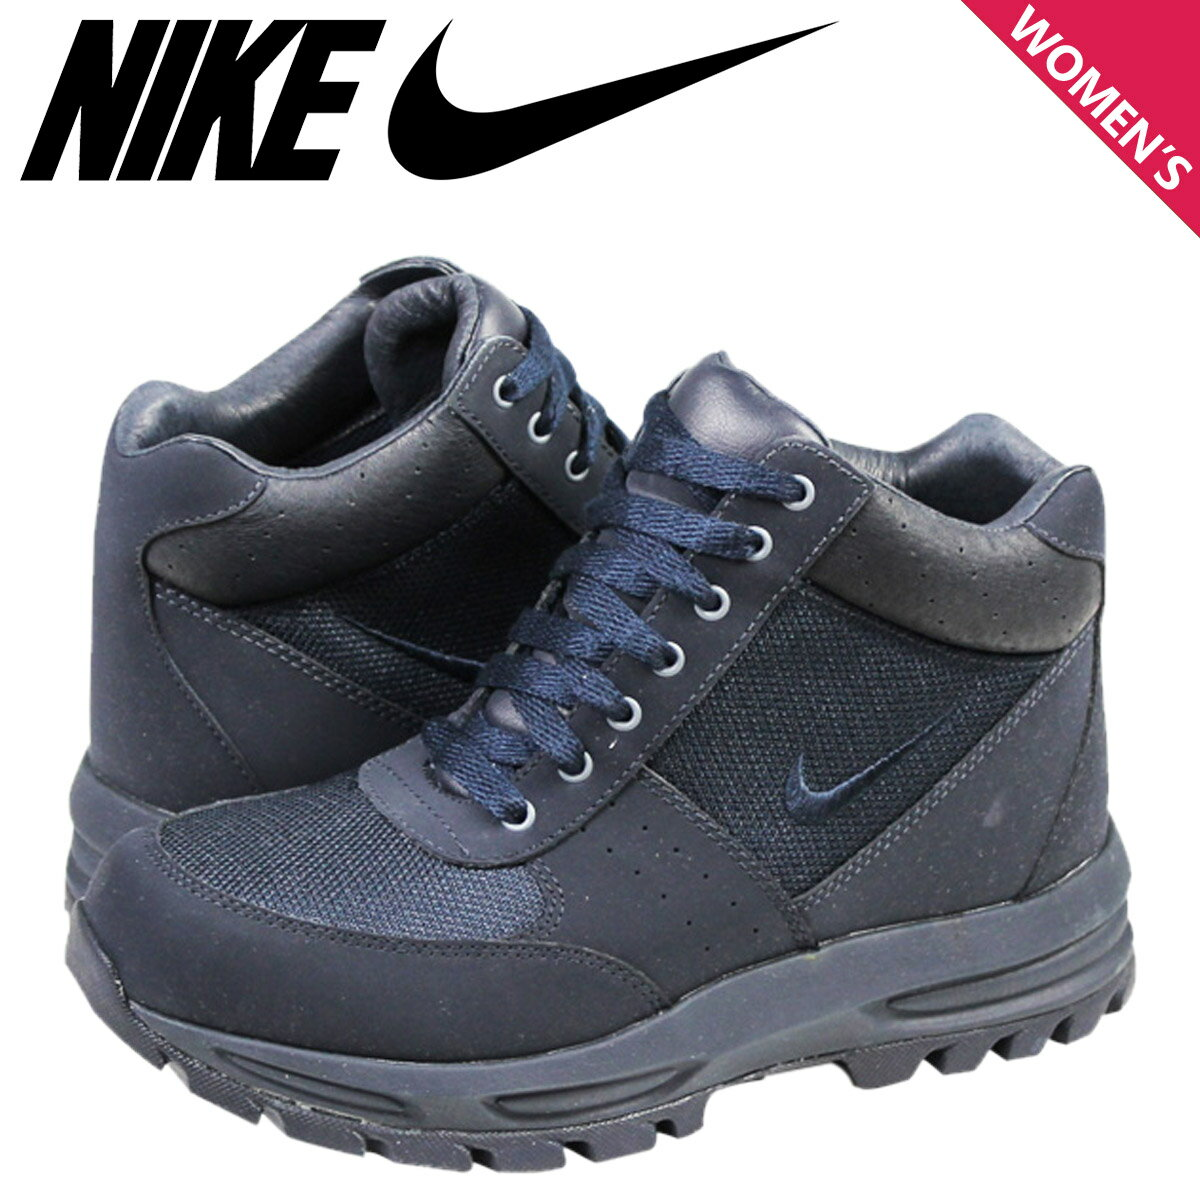 NIKE ナイキ スニーカー ブーツ レディース  GO AWAY ACG TRAIL BOOT GS  375509-401  靴 ネイビー 【9000足】